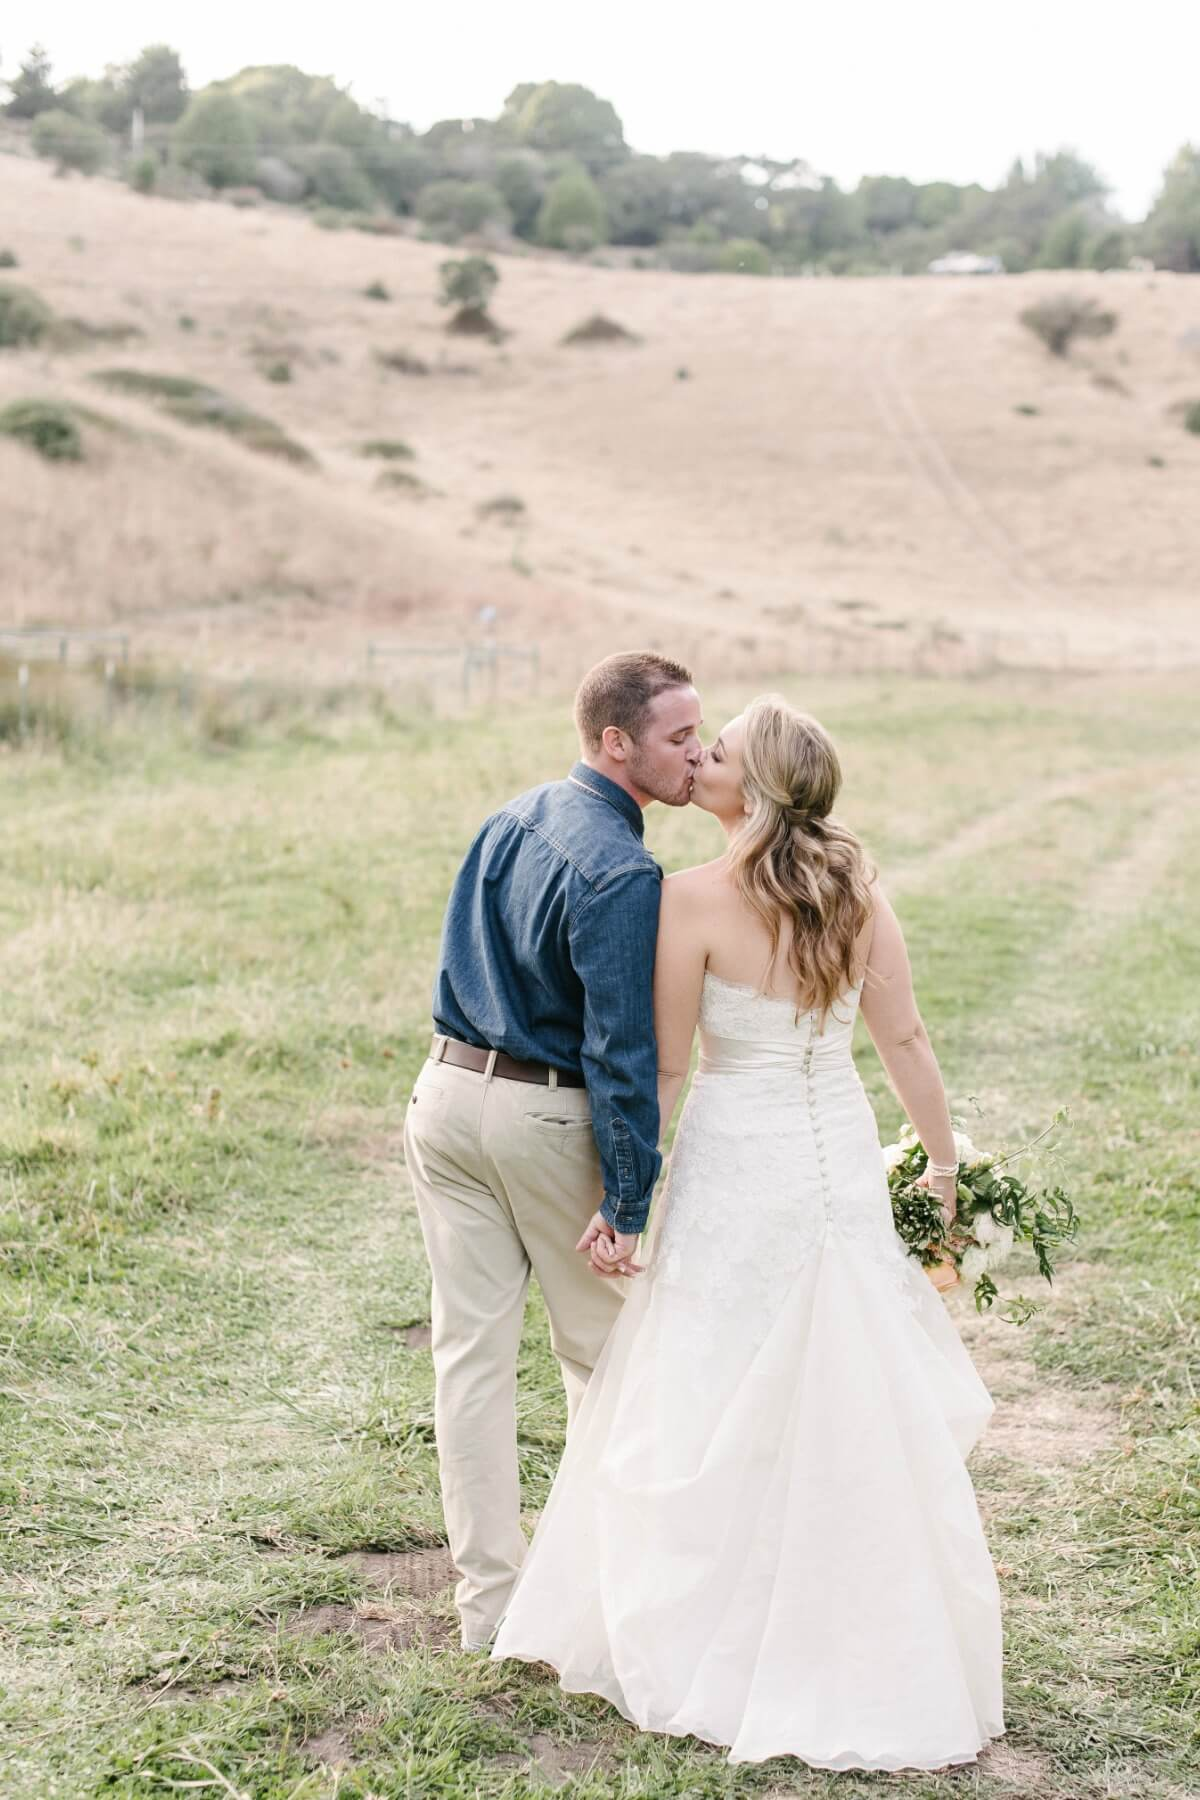 Jessica knopp wedding